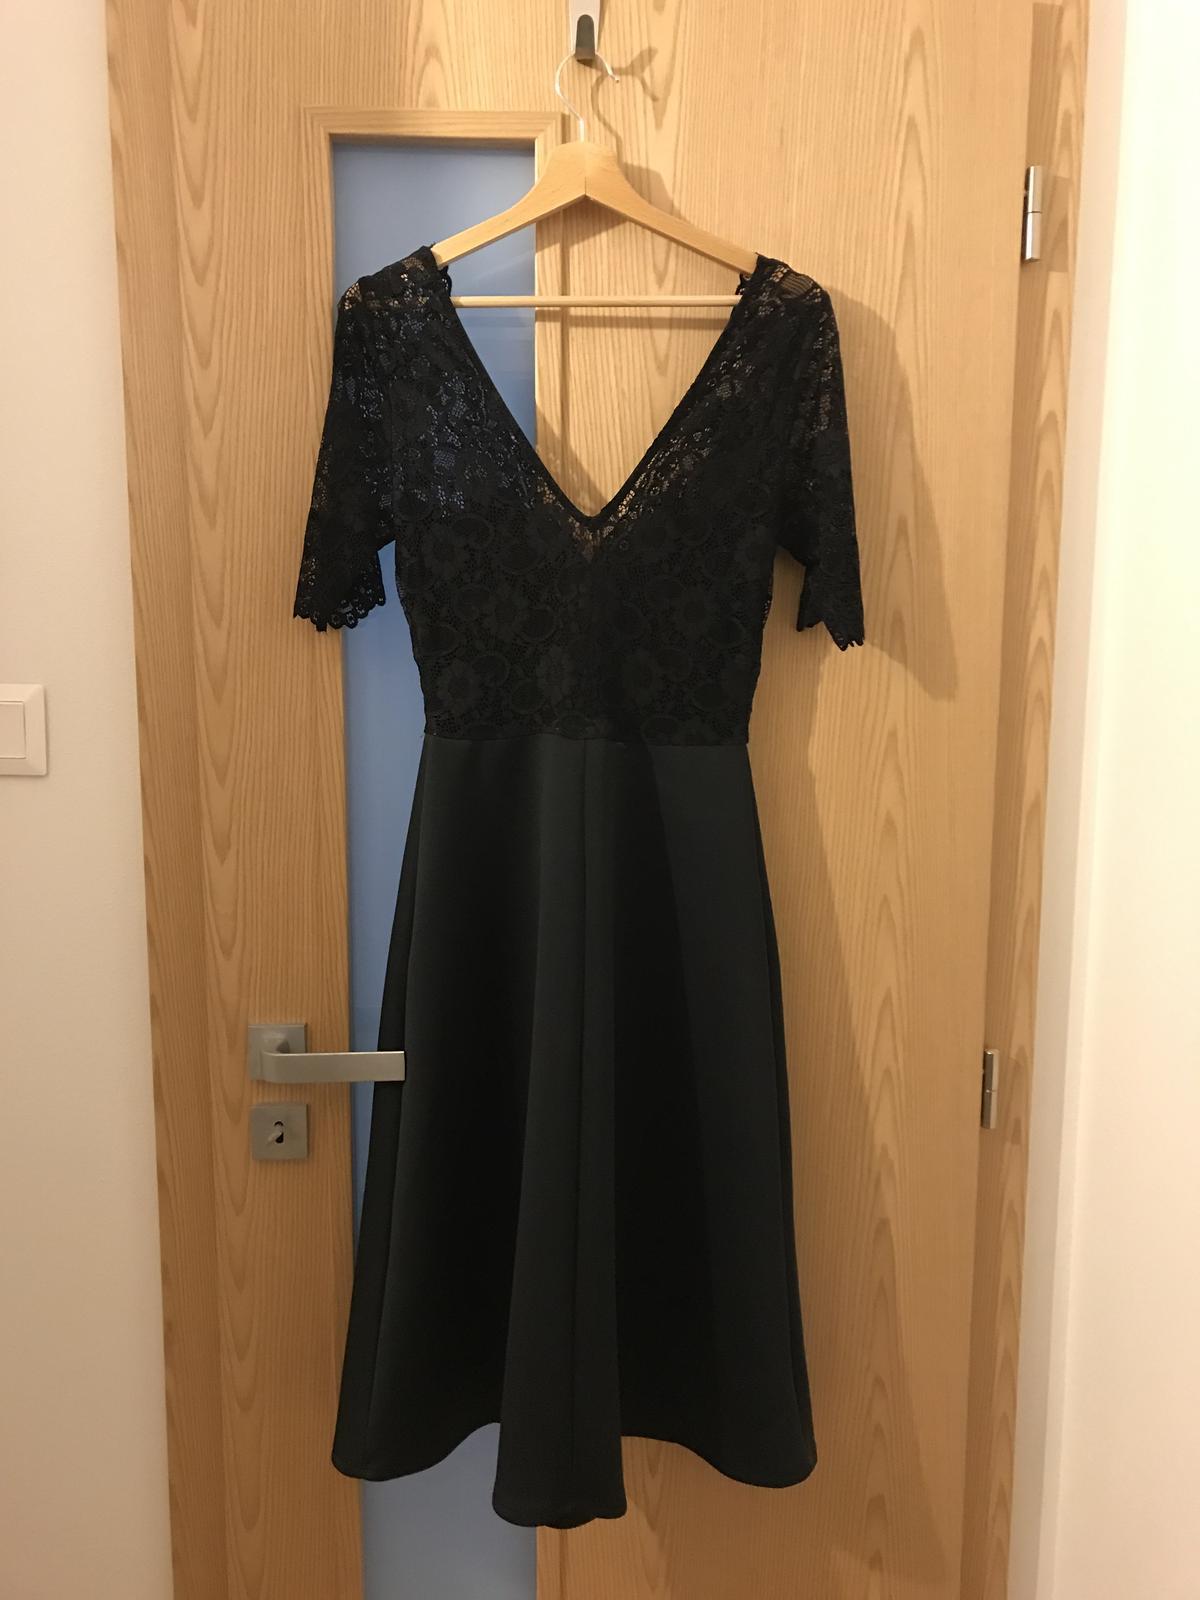 Šaty Elise Ryan - Obrázok č. 2